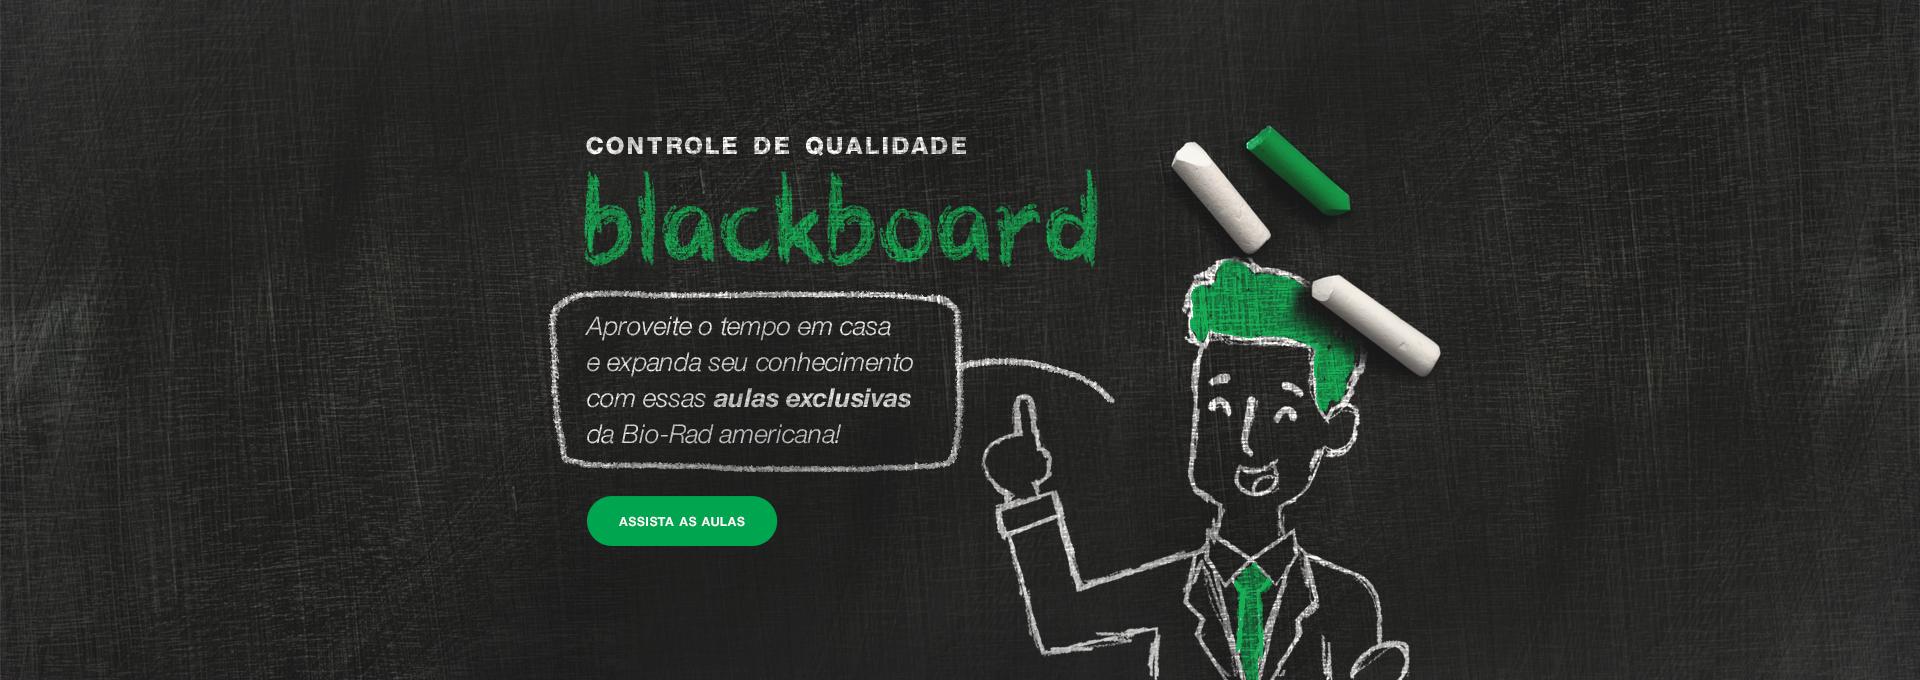 Home qsd blackboard